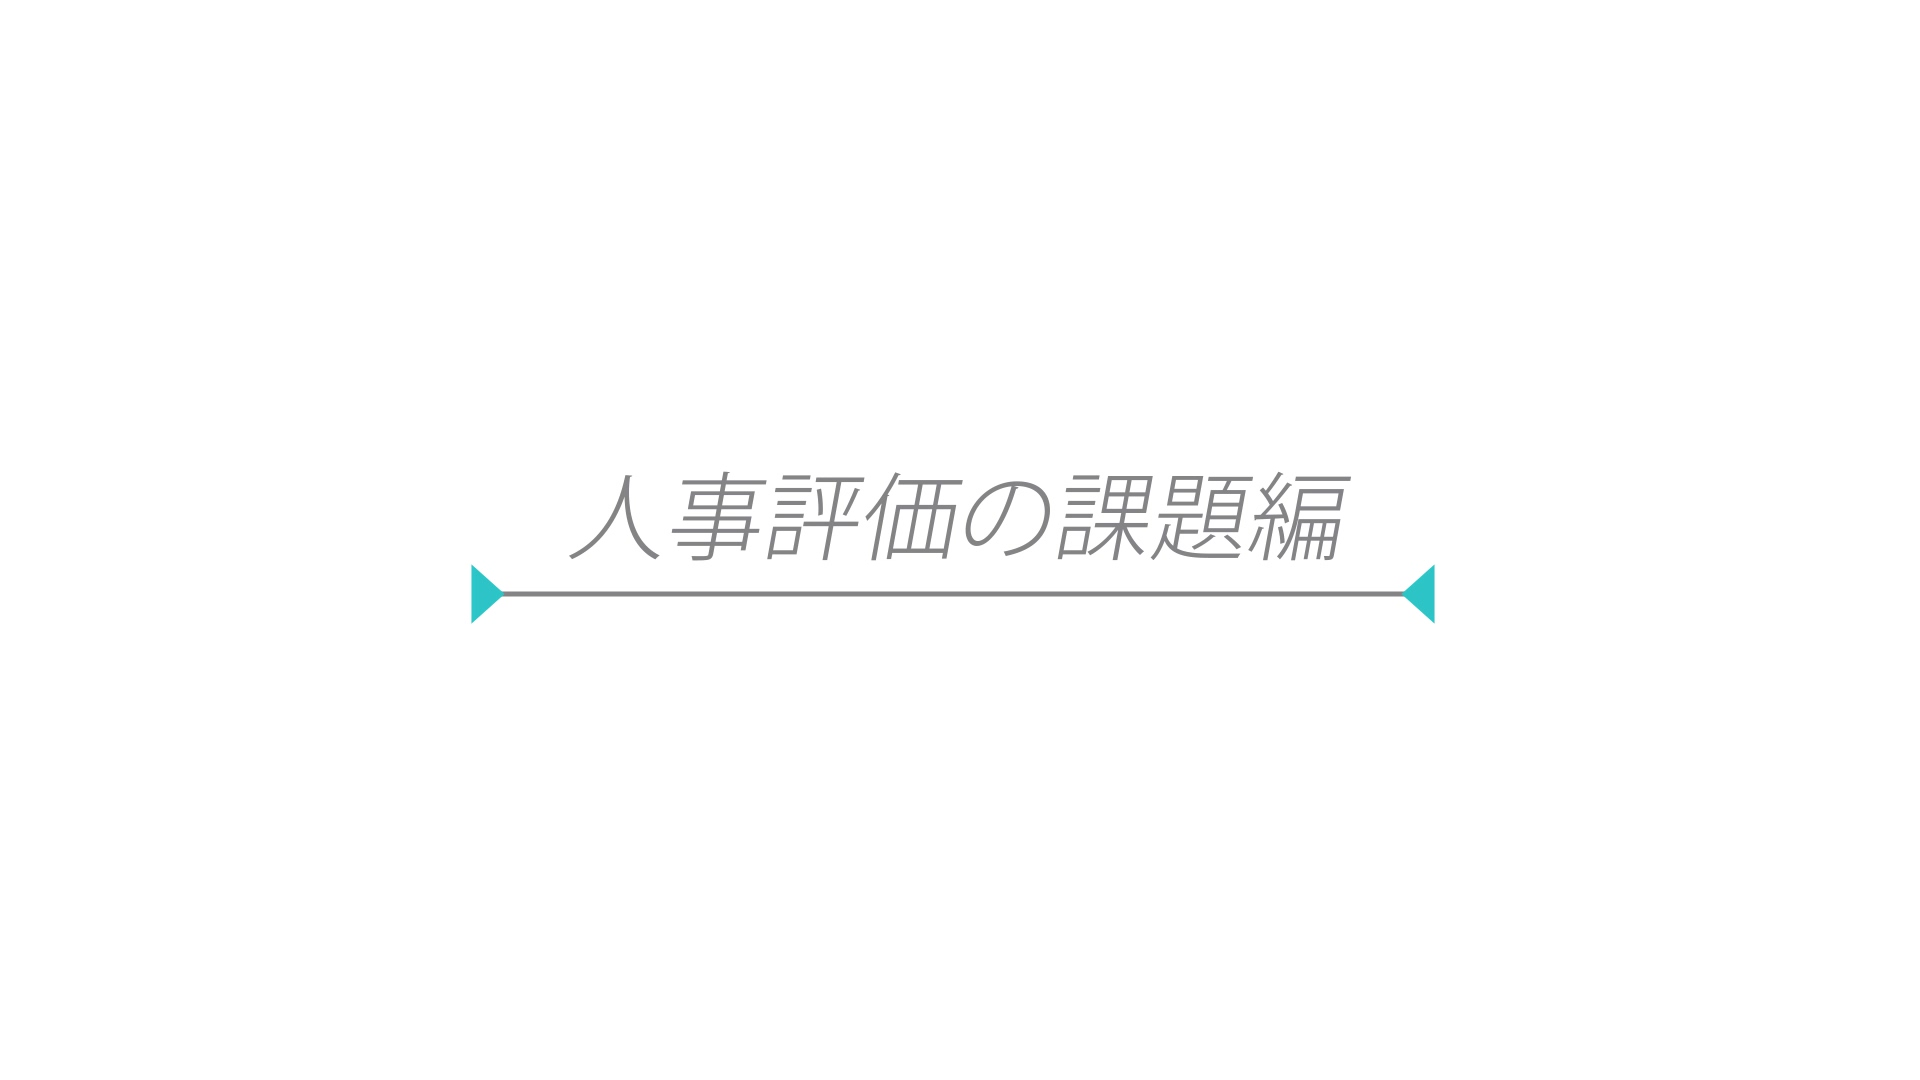 pth-assignment-sub